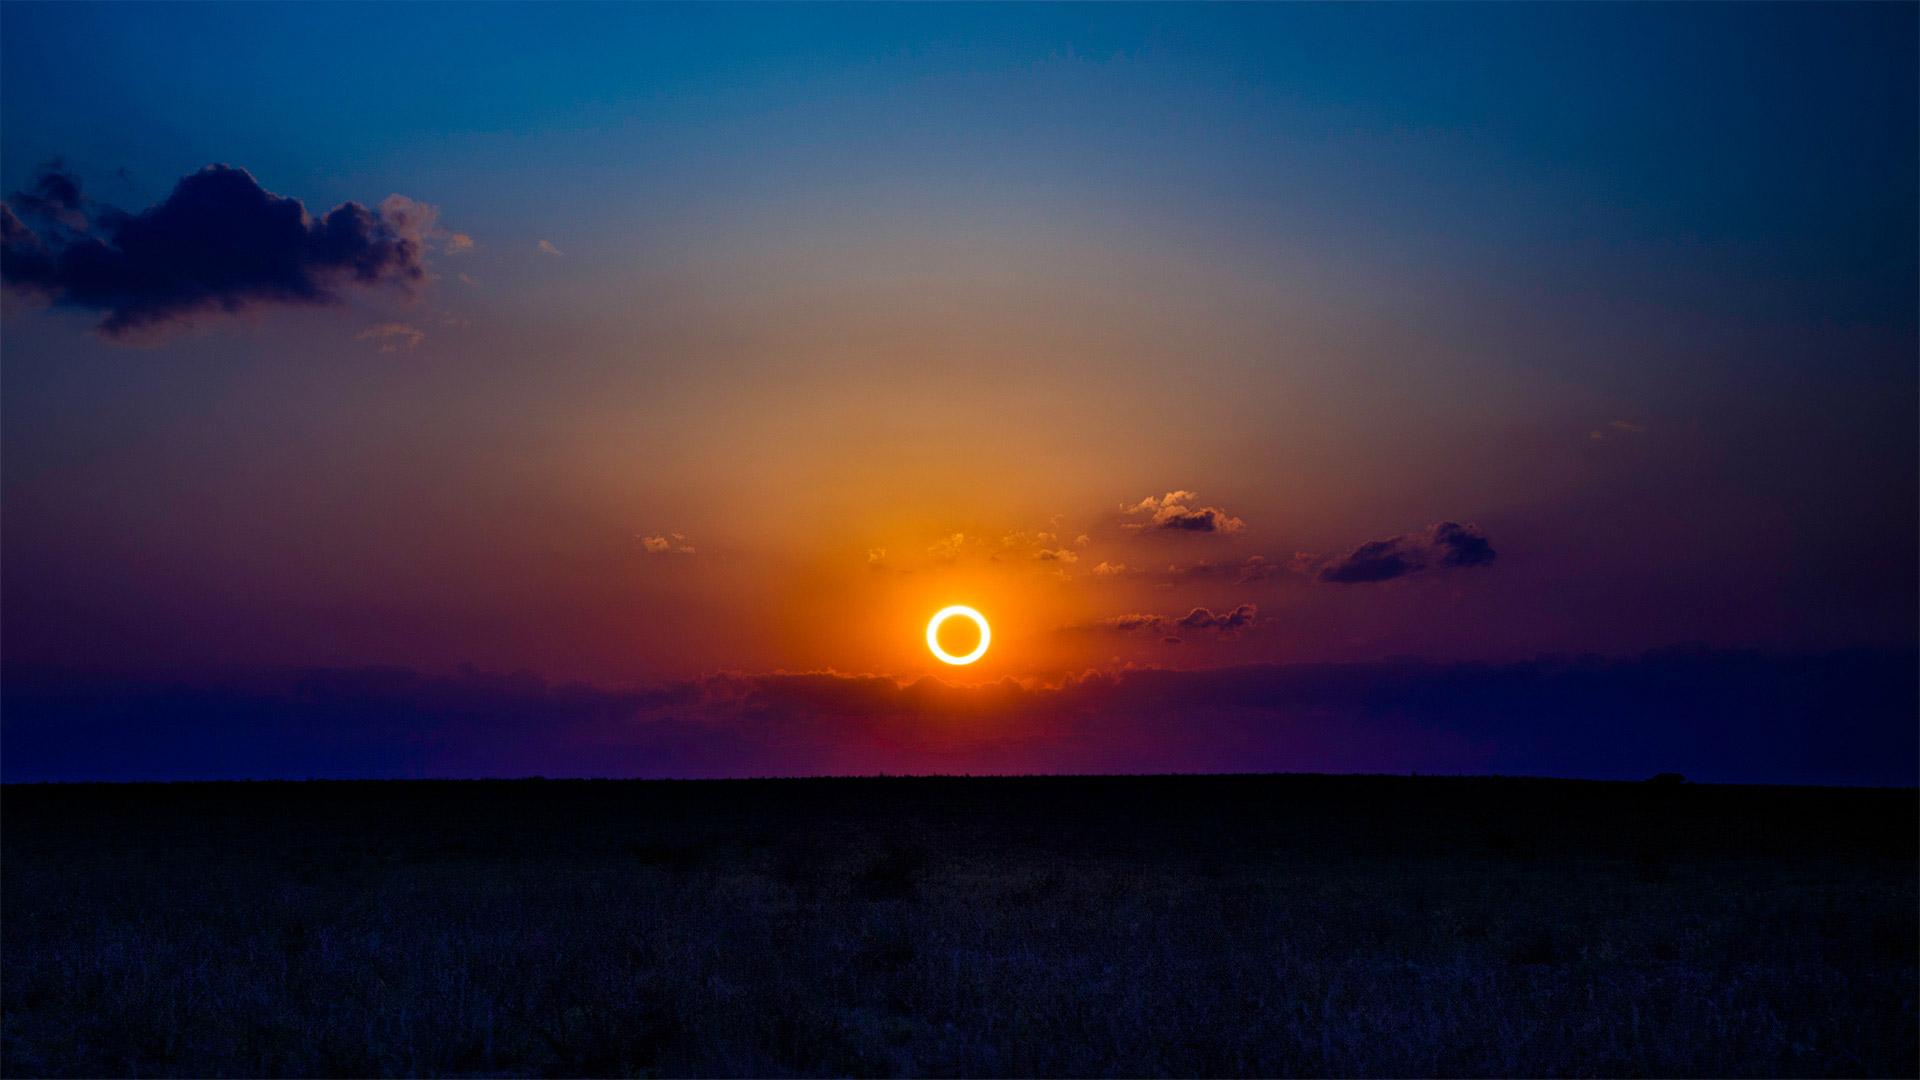 AnnularEclipse_ZH-CN2345201060